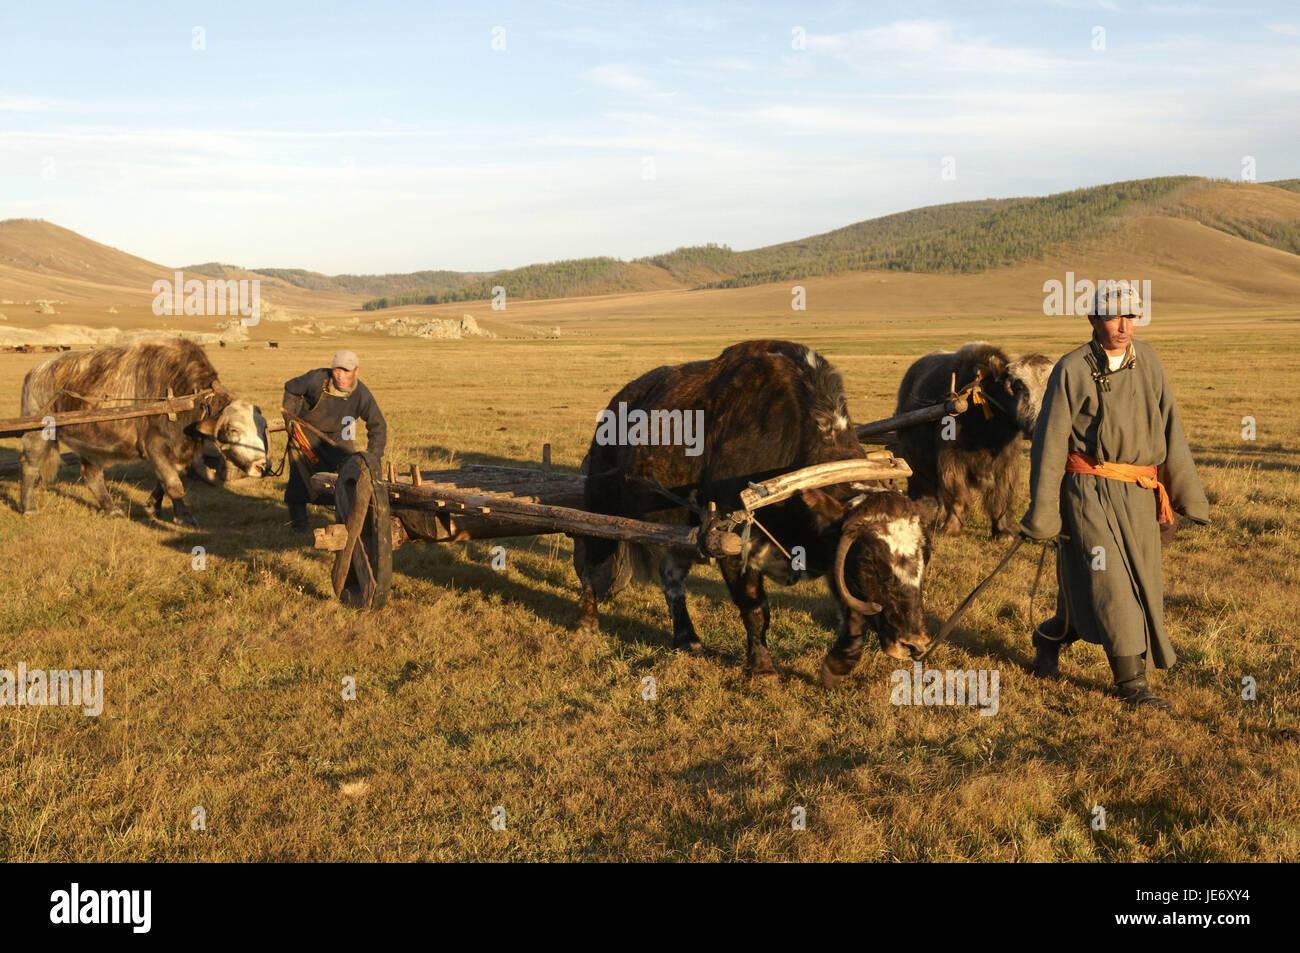 Mongolia, Asia Central, la provincia Arkhangai, nómada, yaks, carruajes, Imagen De Stock